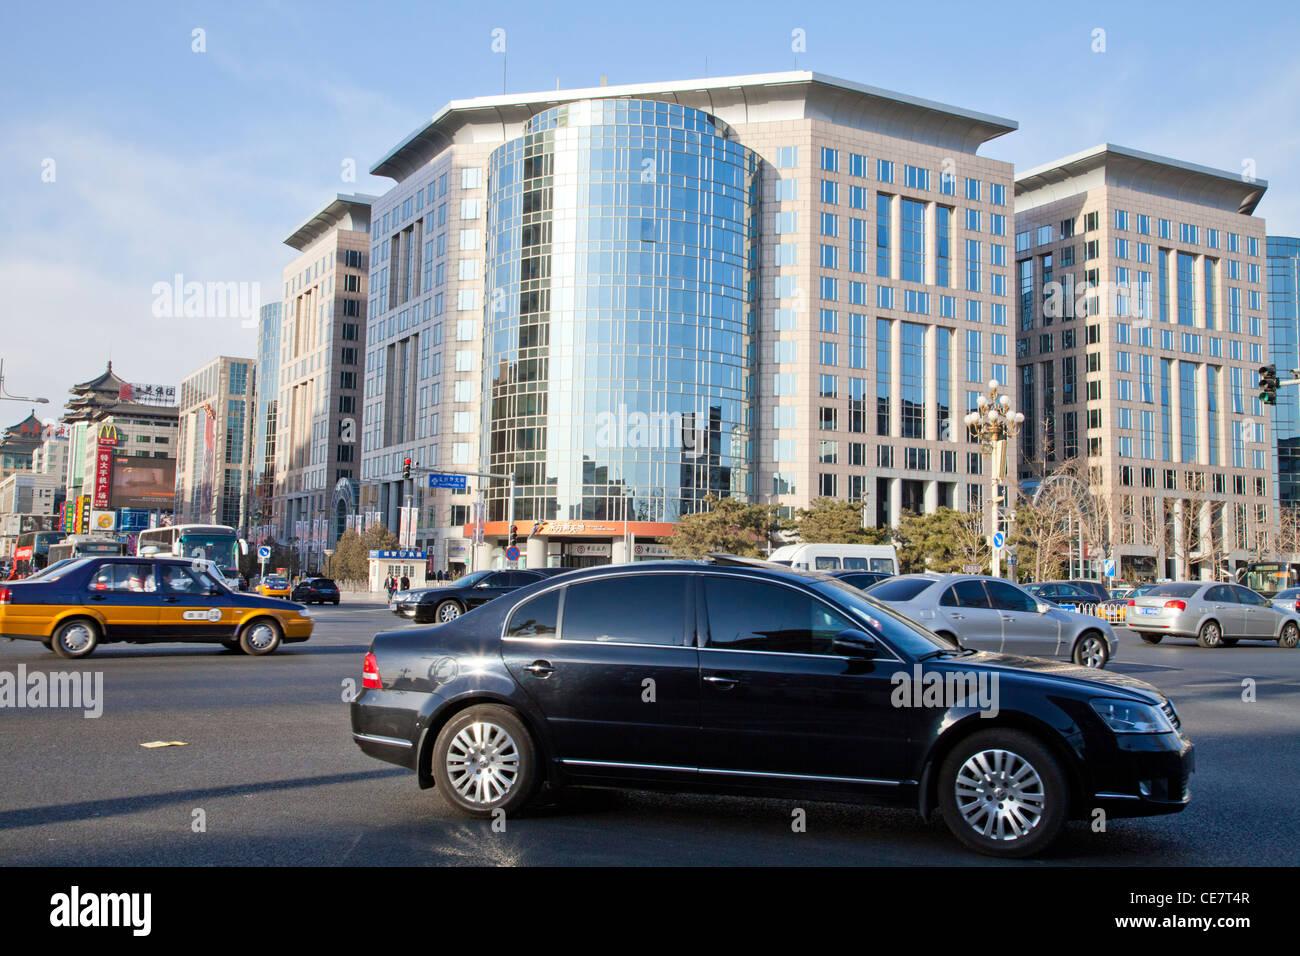 Luxury shopping mall Oriental Plaza in Wangfujing Street, Beijing, and traffic. - Stock Image